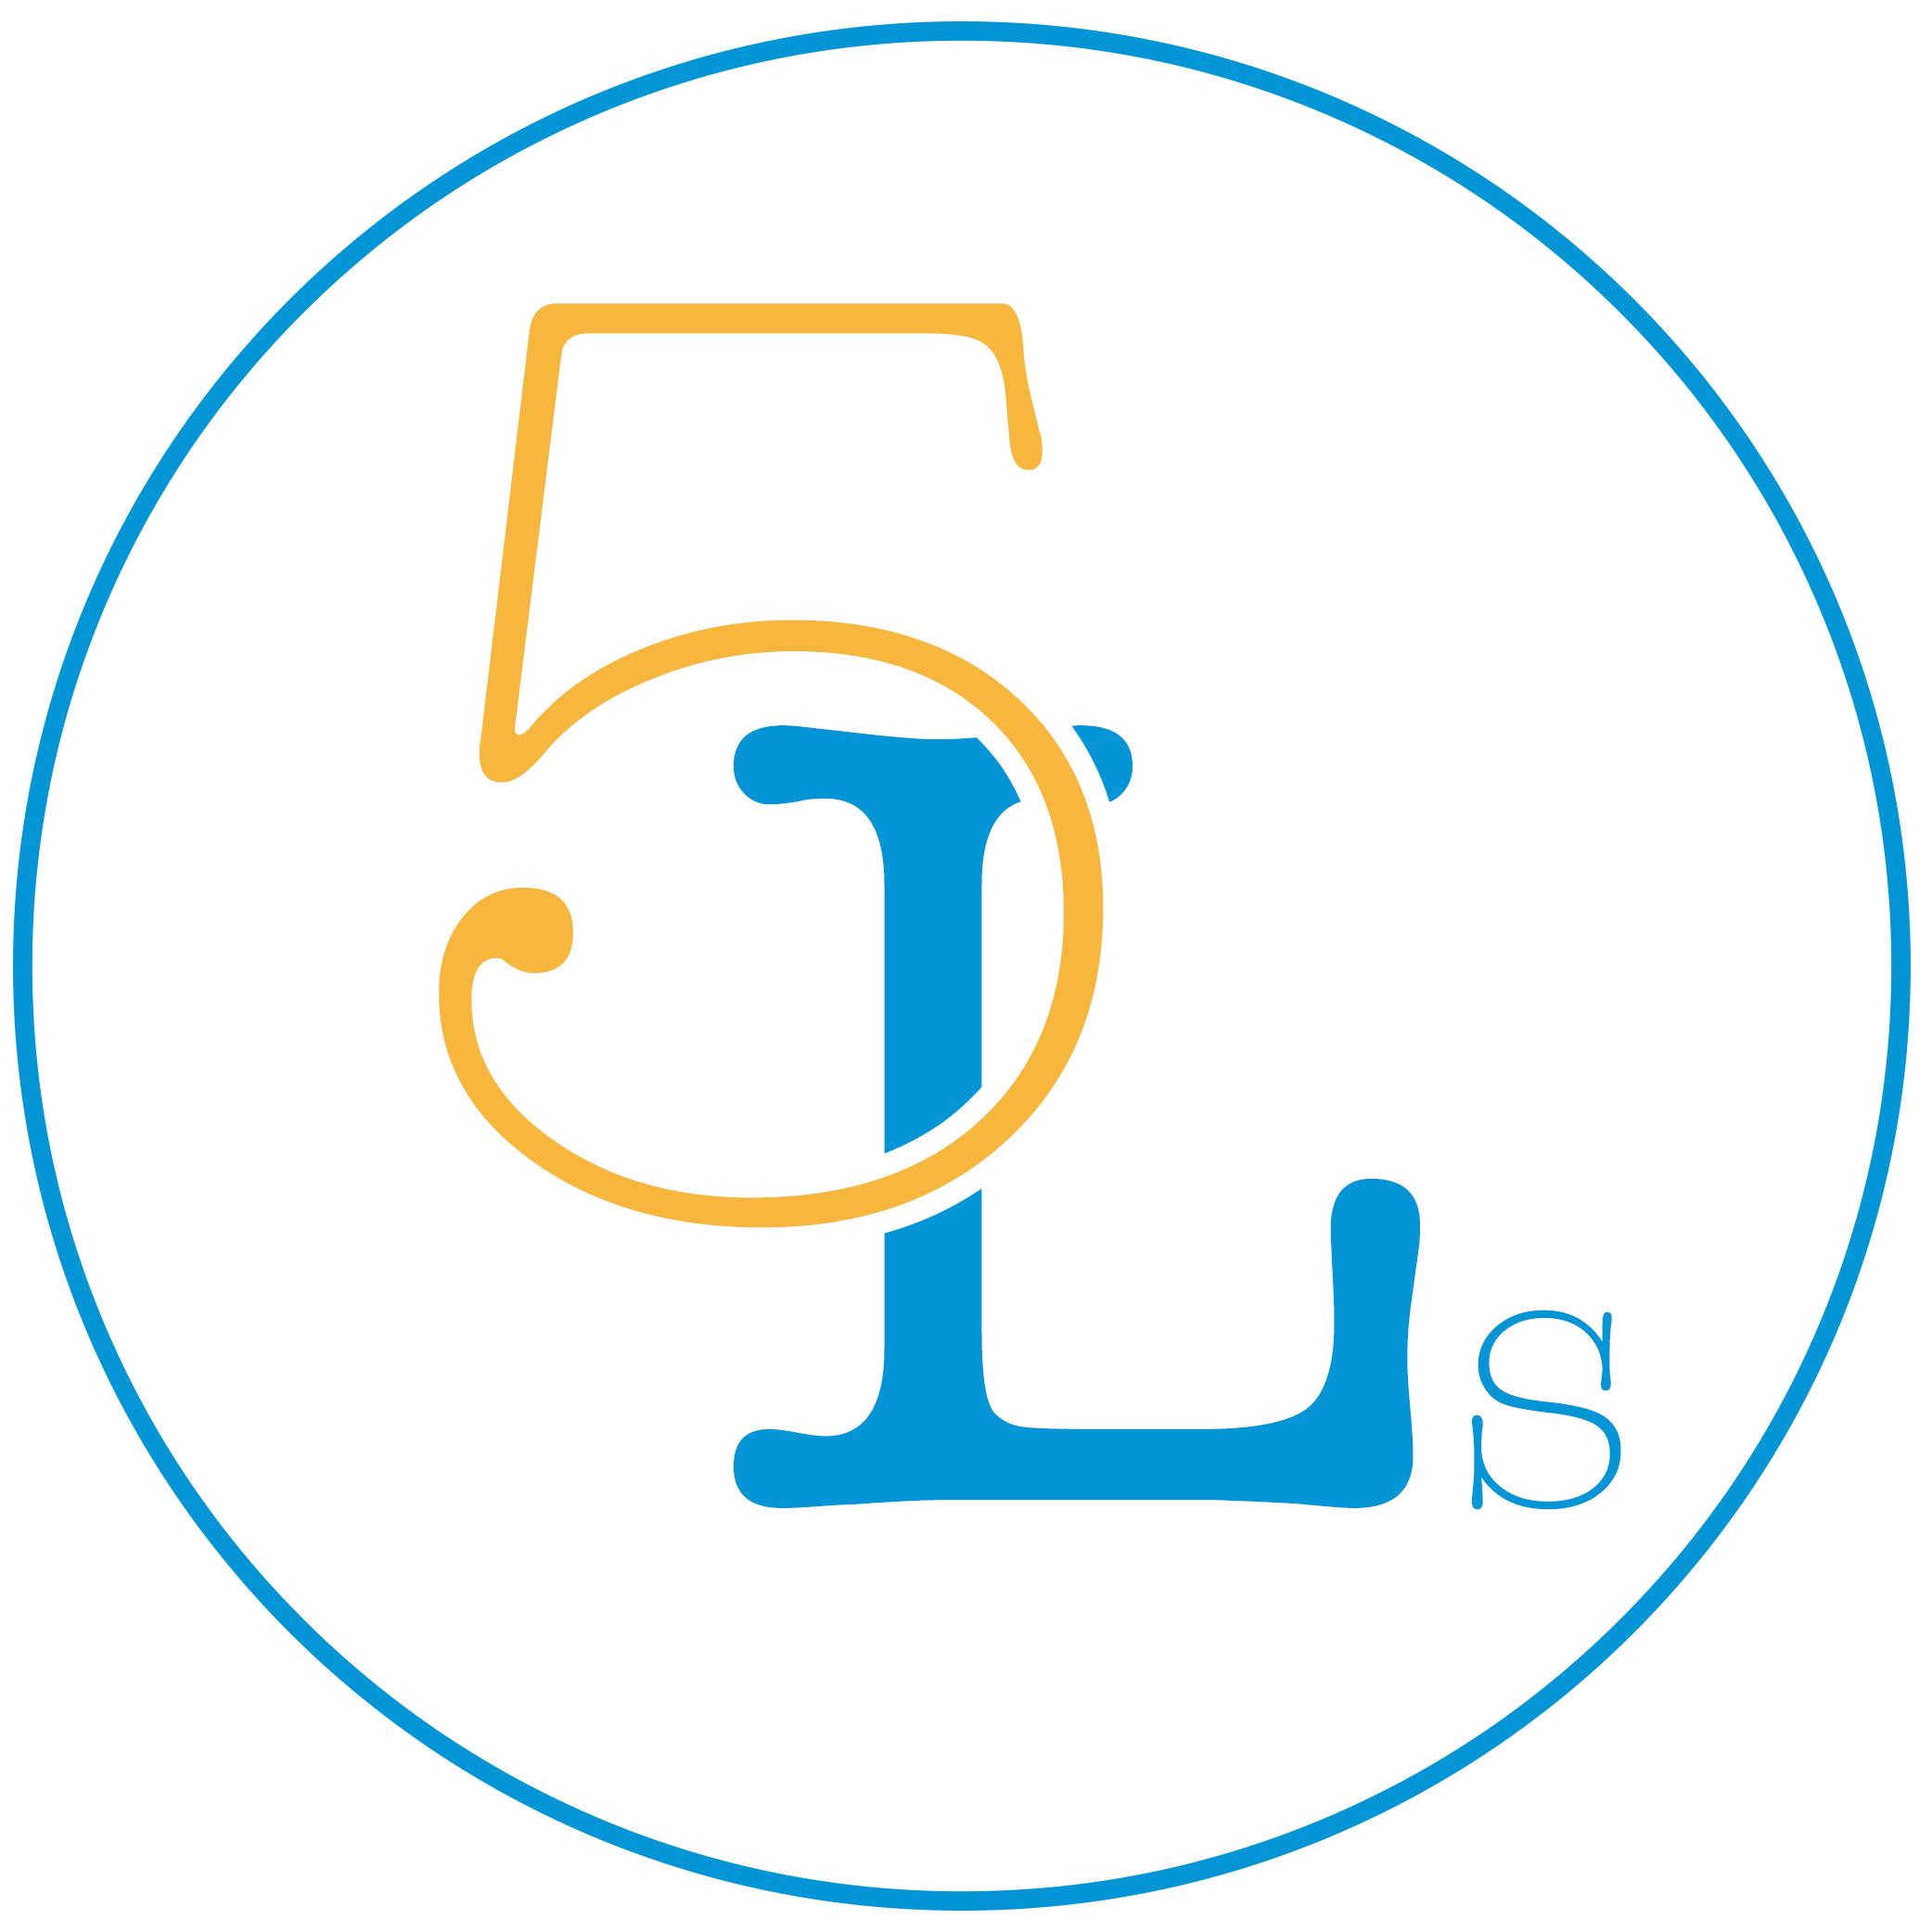 5Ls.jpg